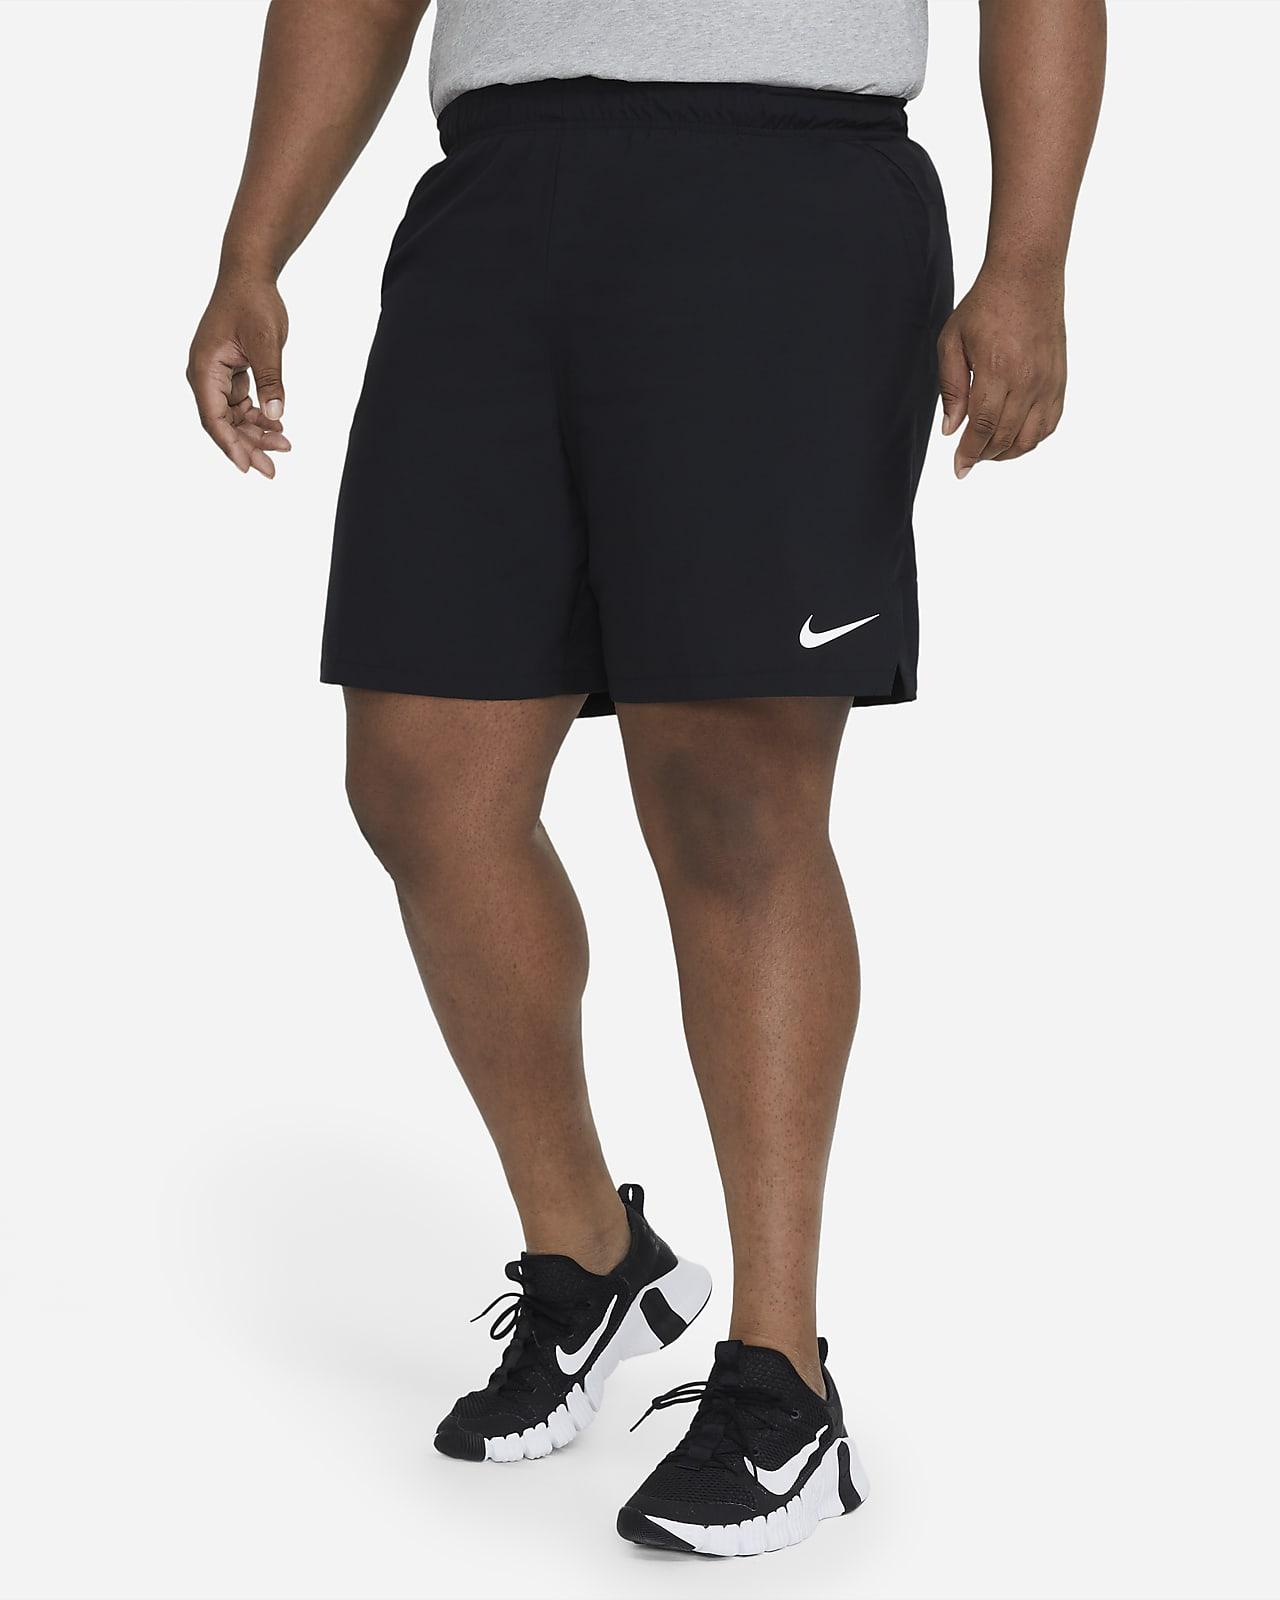 Nike Dri-FIT Men's Woven Training Shorts (Big & Tall)